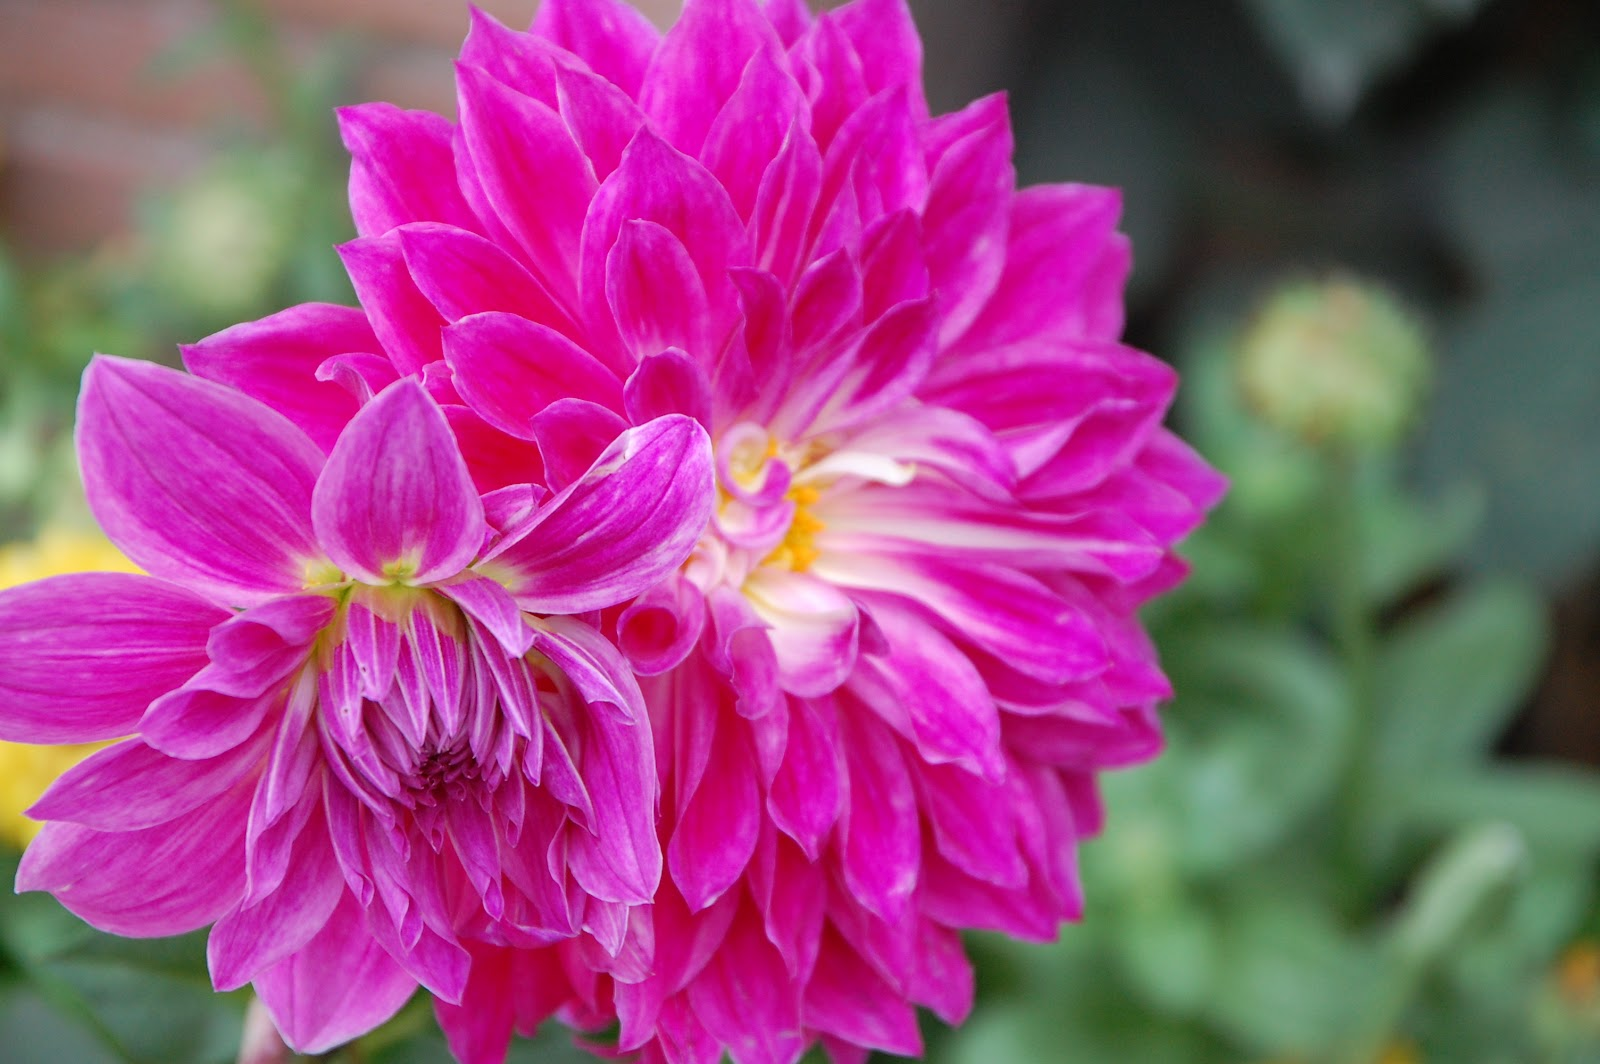 Hd wallpaper yellow rose - Best Pics Store Best Top 15 Flower S